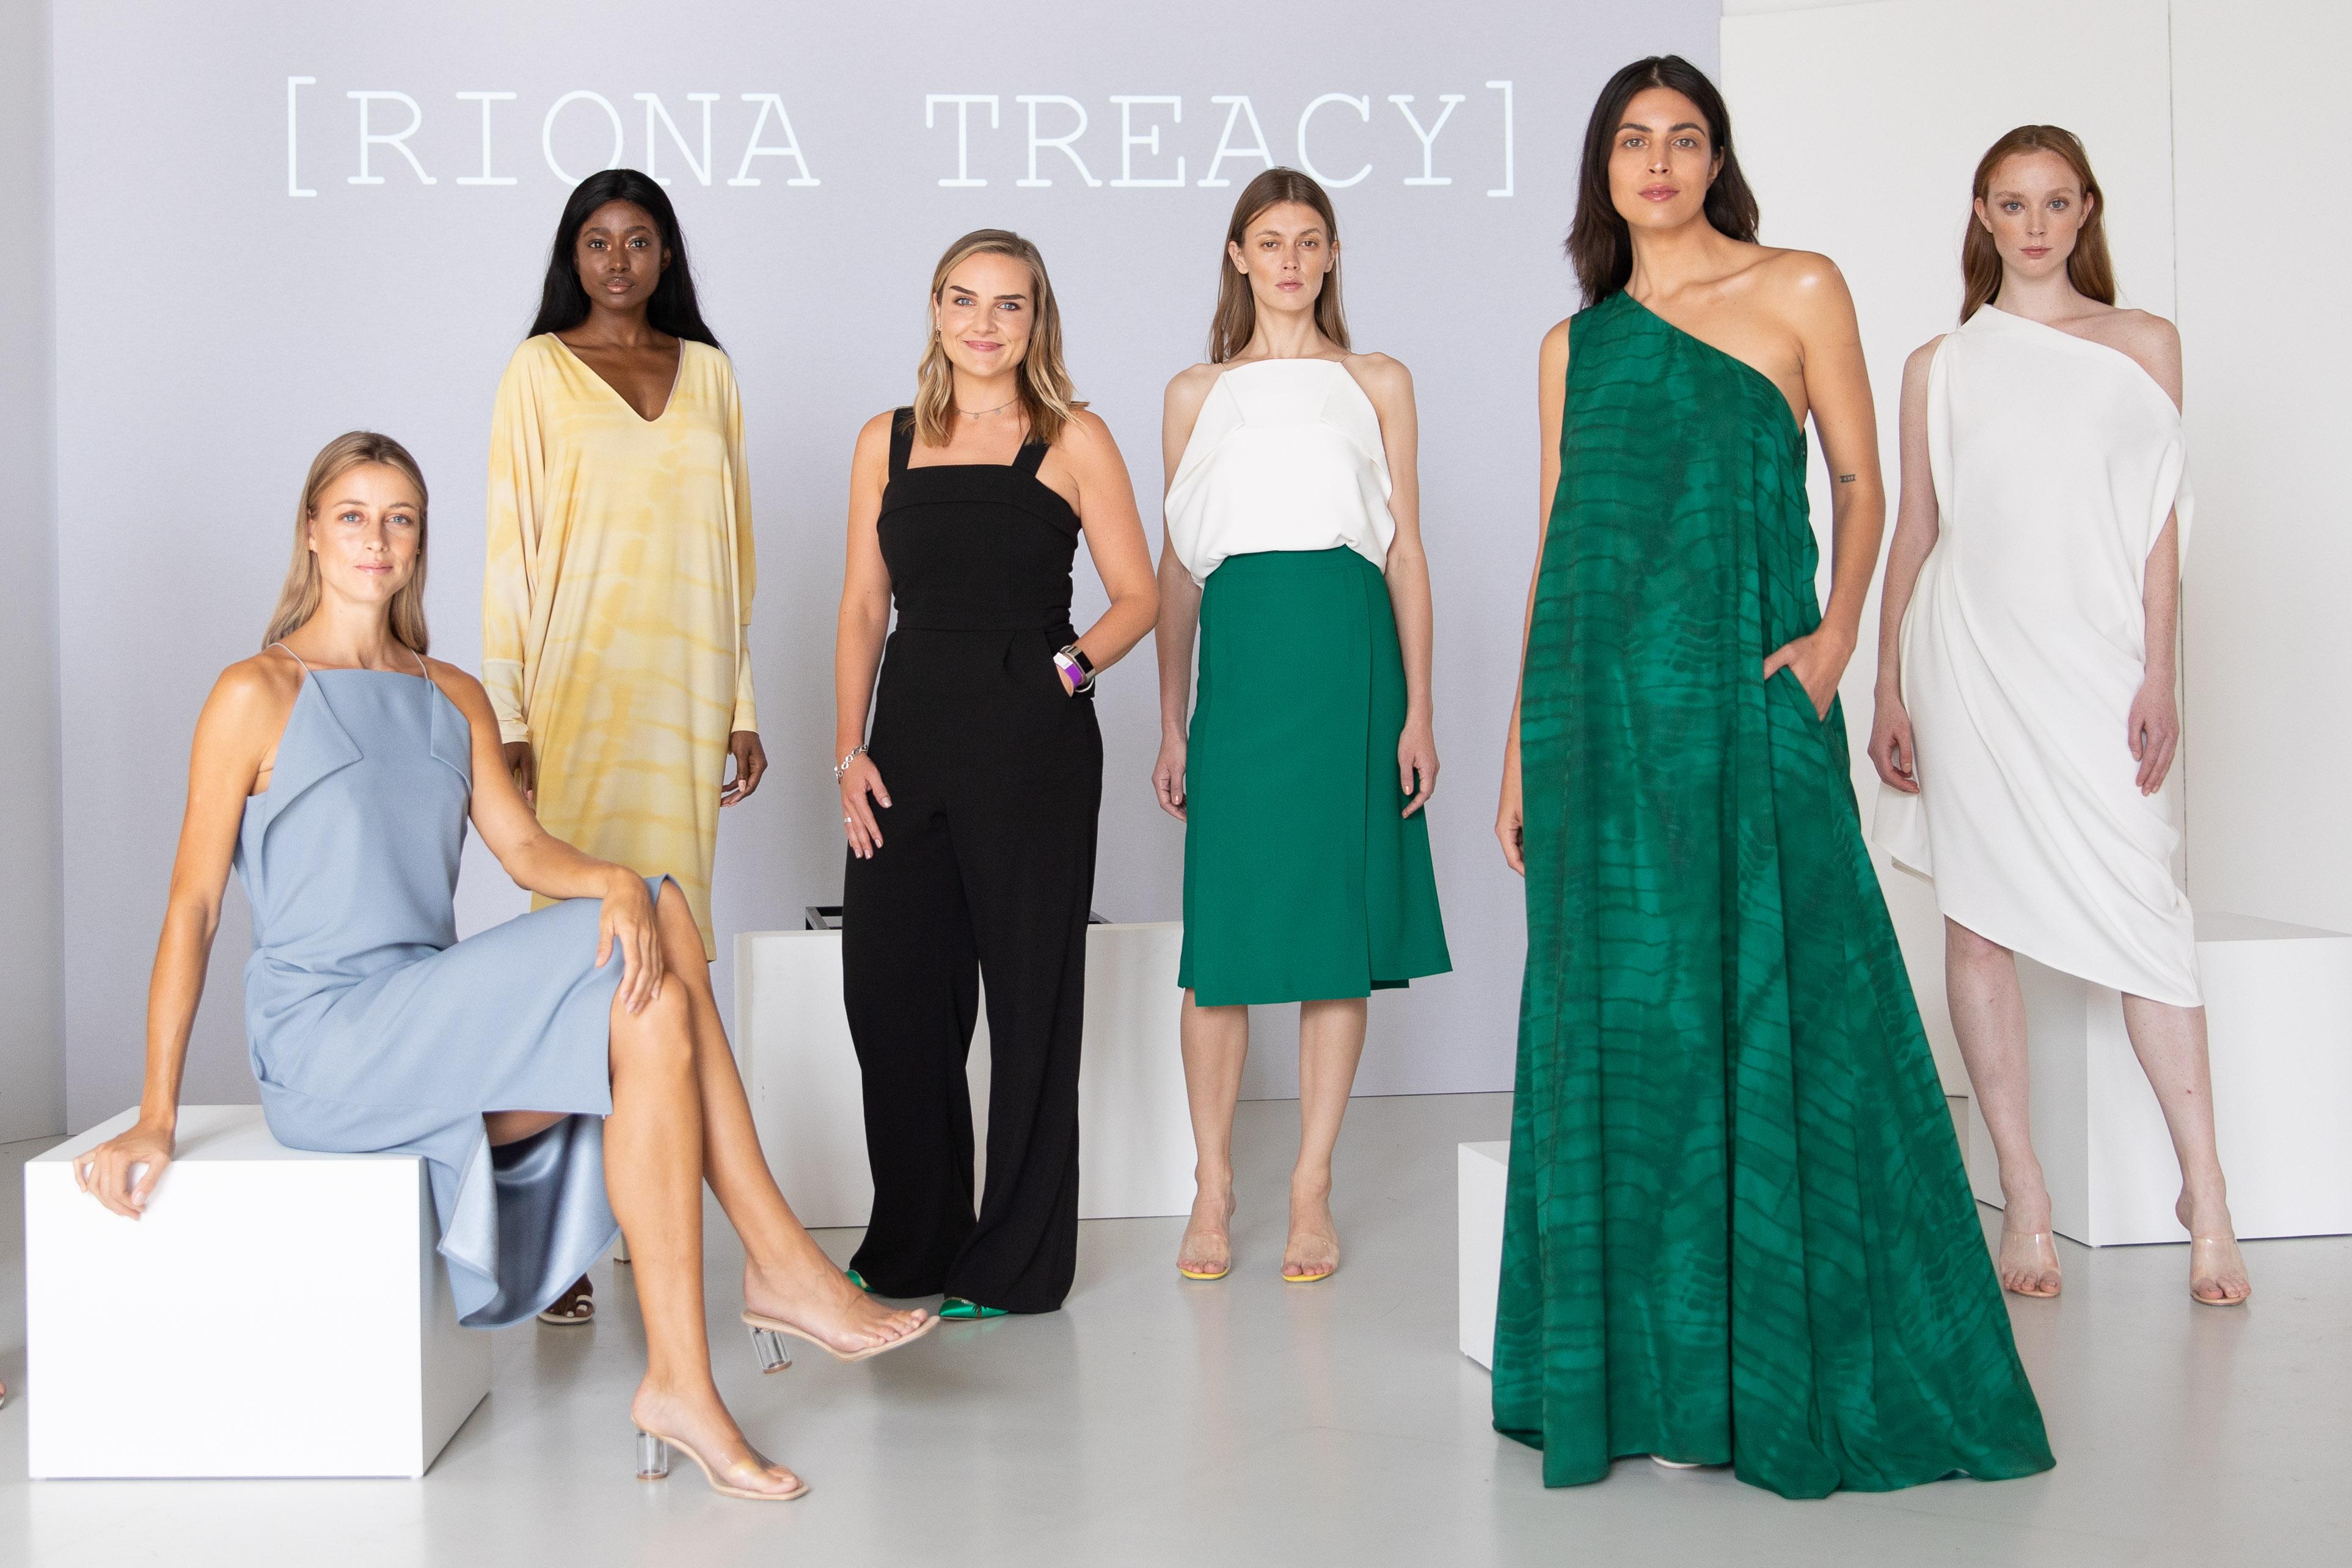 London Fashion Week Spring Summer 2020  – Riona Treacy